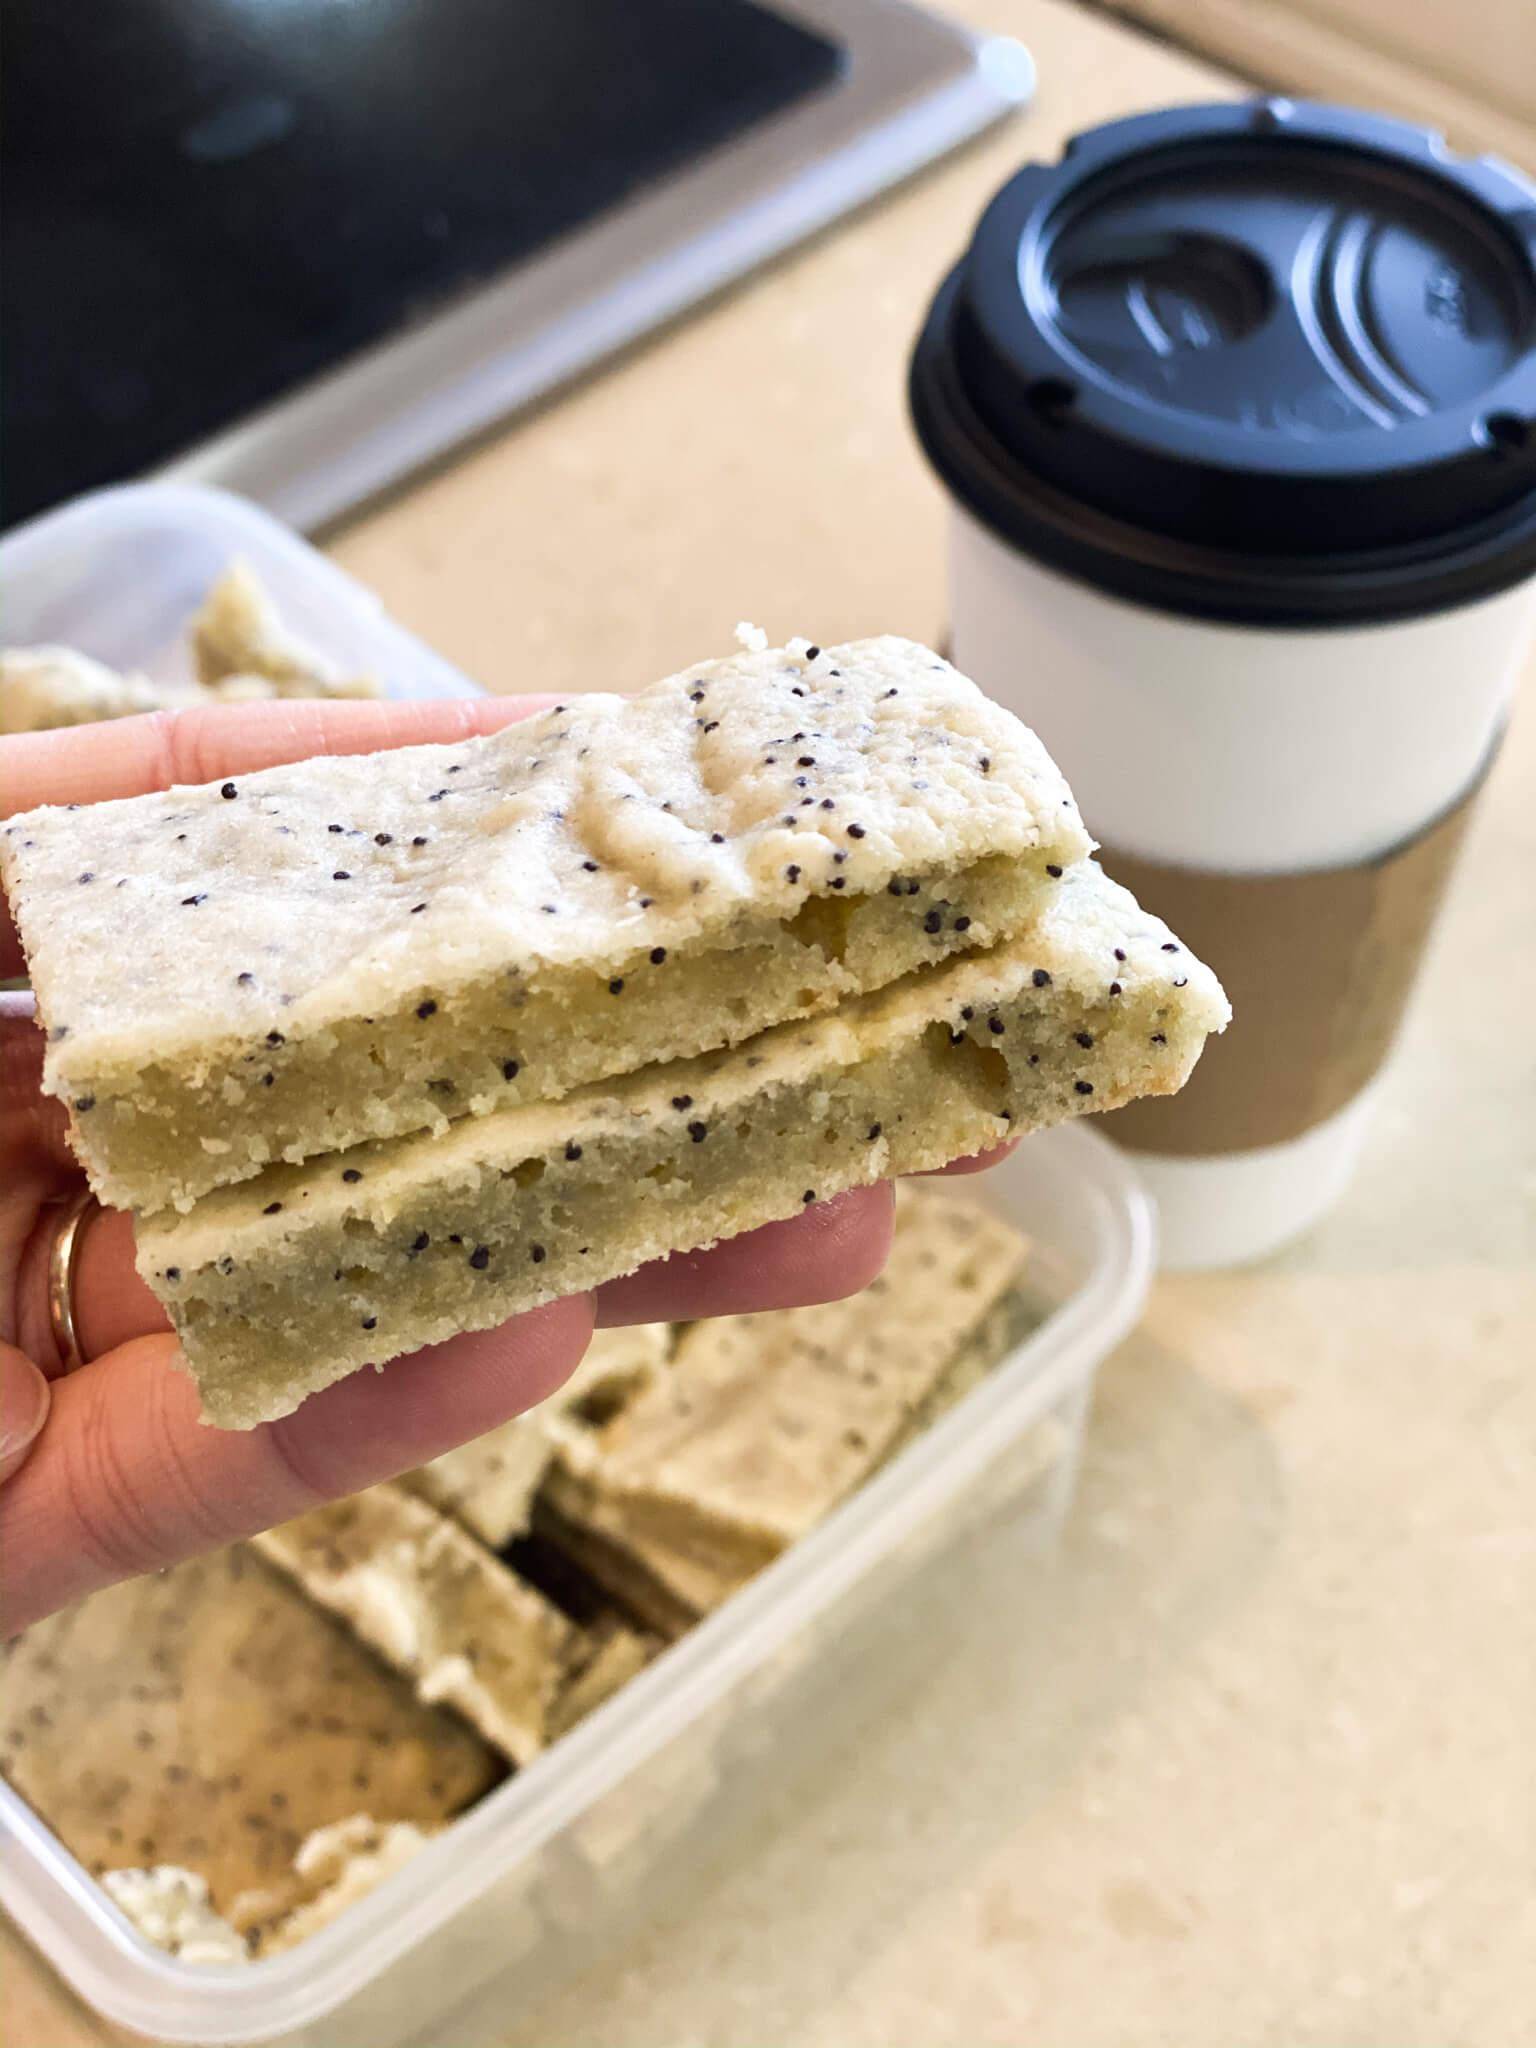 Gluten and Dairy-Free Almond Poppy Seed Sheet Cake Recipe agutsygirl.com #glutenfreerecipe #dairyfreerecipe #glutenfreedairyfree #poppyseed TRIO coffee